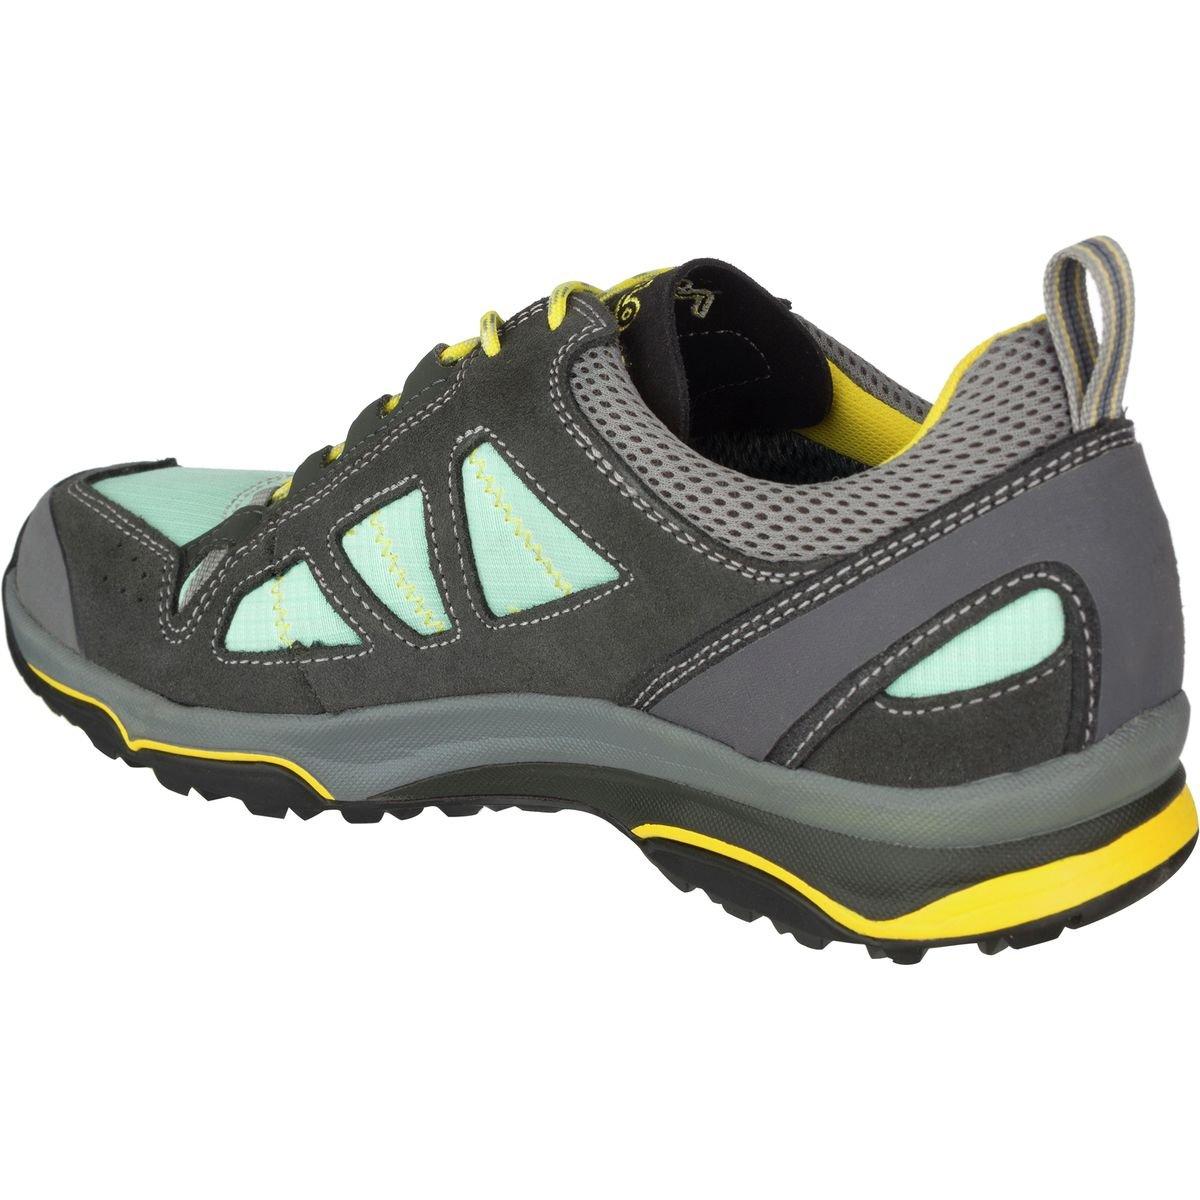 Asolo Megaton GV GTX Hiking Shoe - Women's-Graphite/Pool A40011-Graphite/Pool Side-6.5 by Asolo (Image #3)